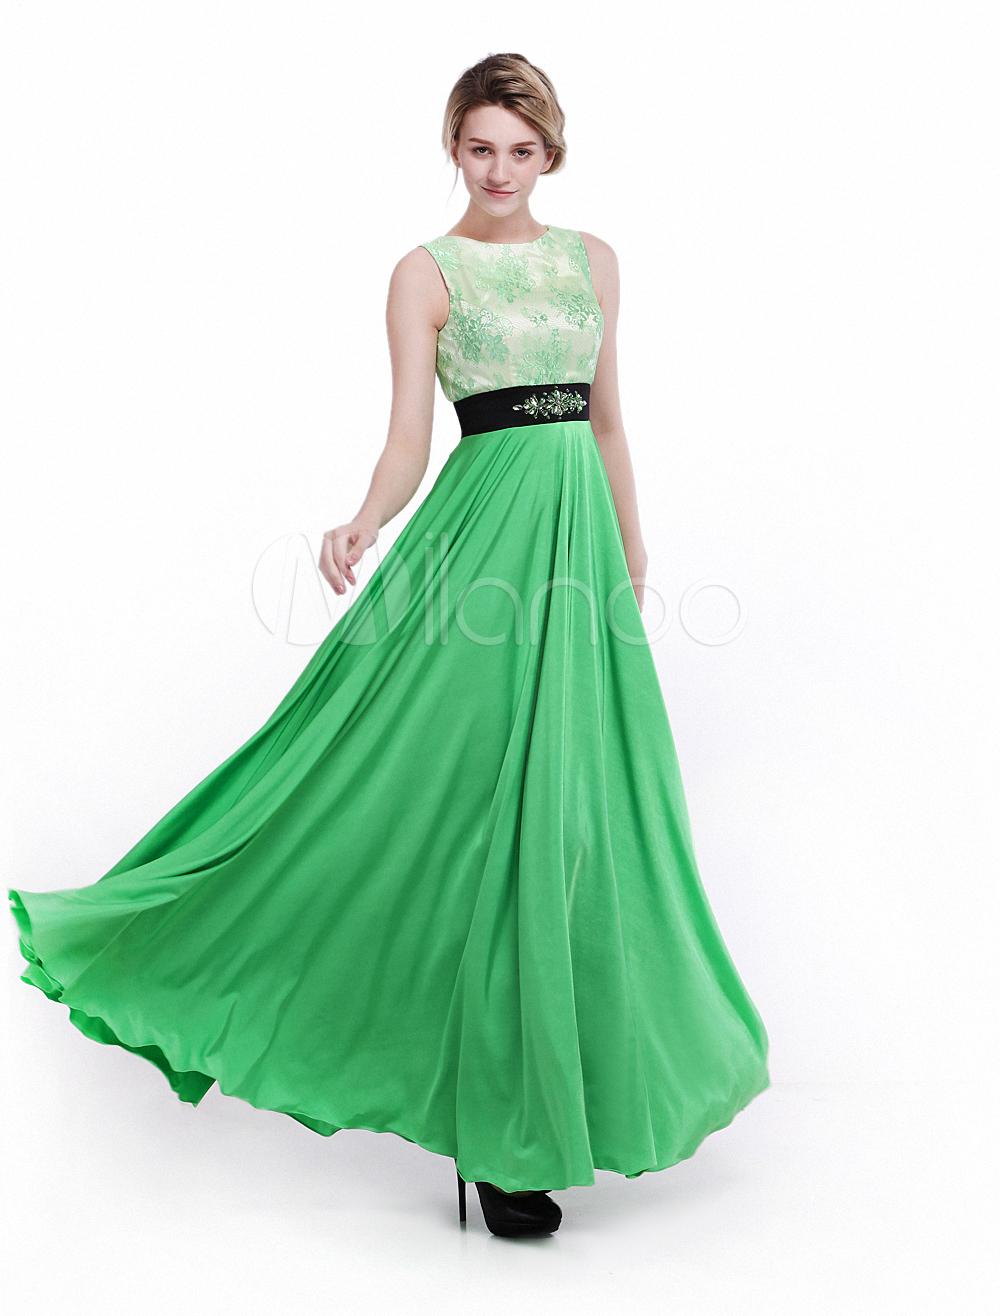 Avocado Green Prom Dress Empire Jewel Neck Rhinestone A Line Pleated ...